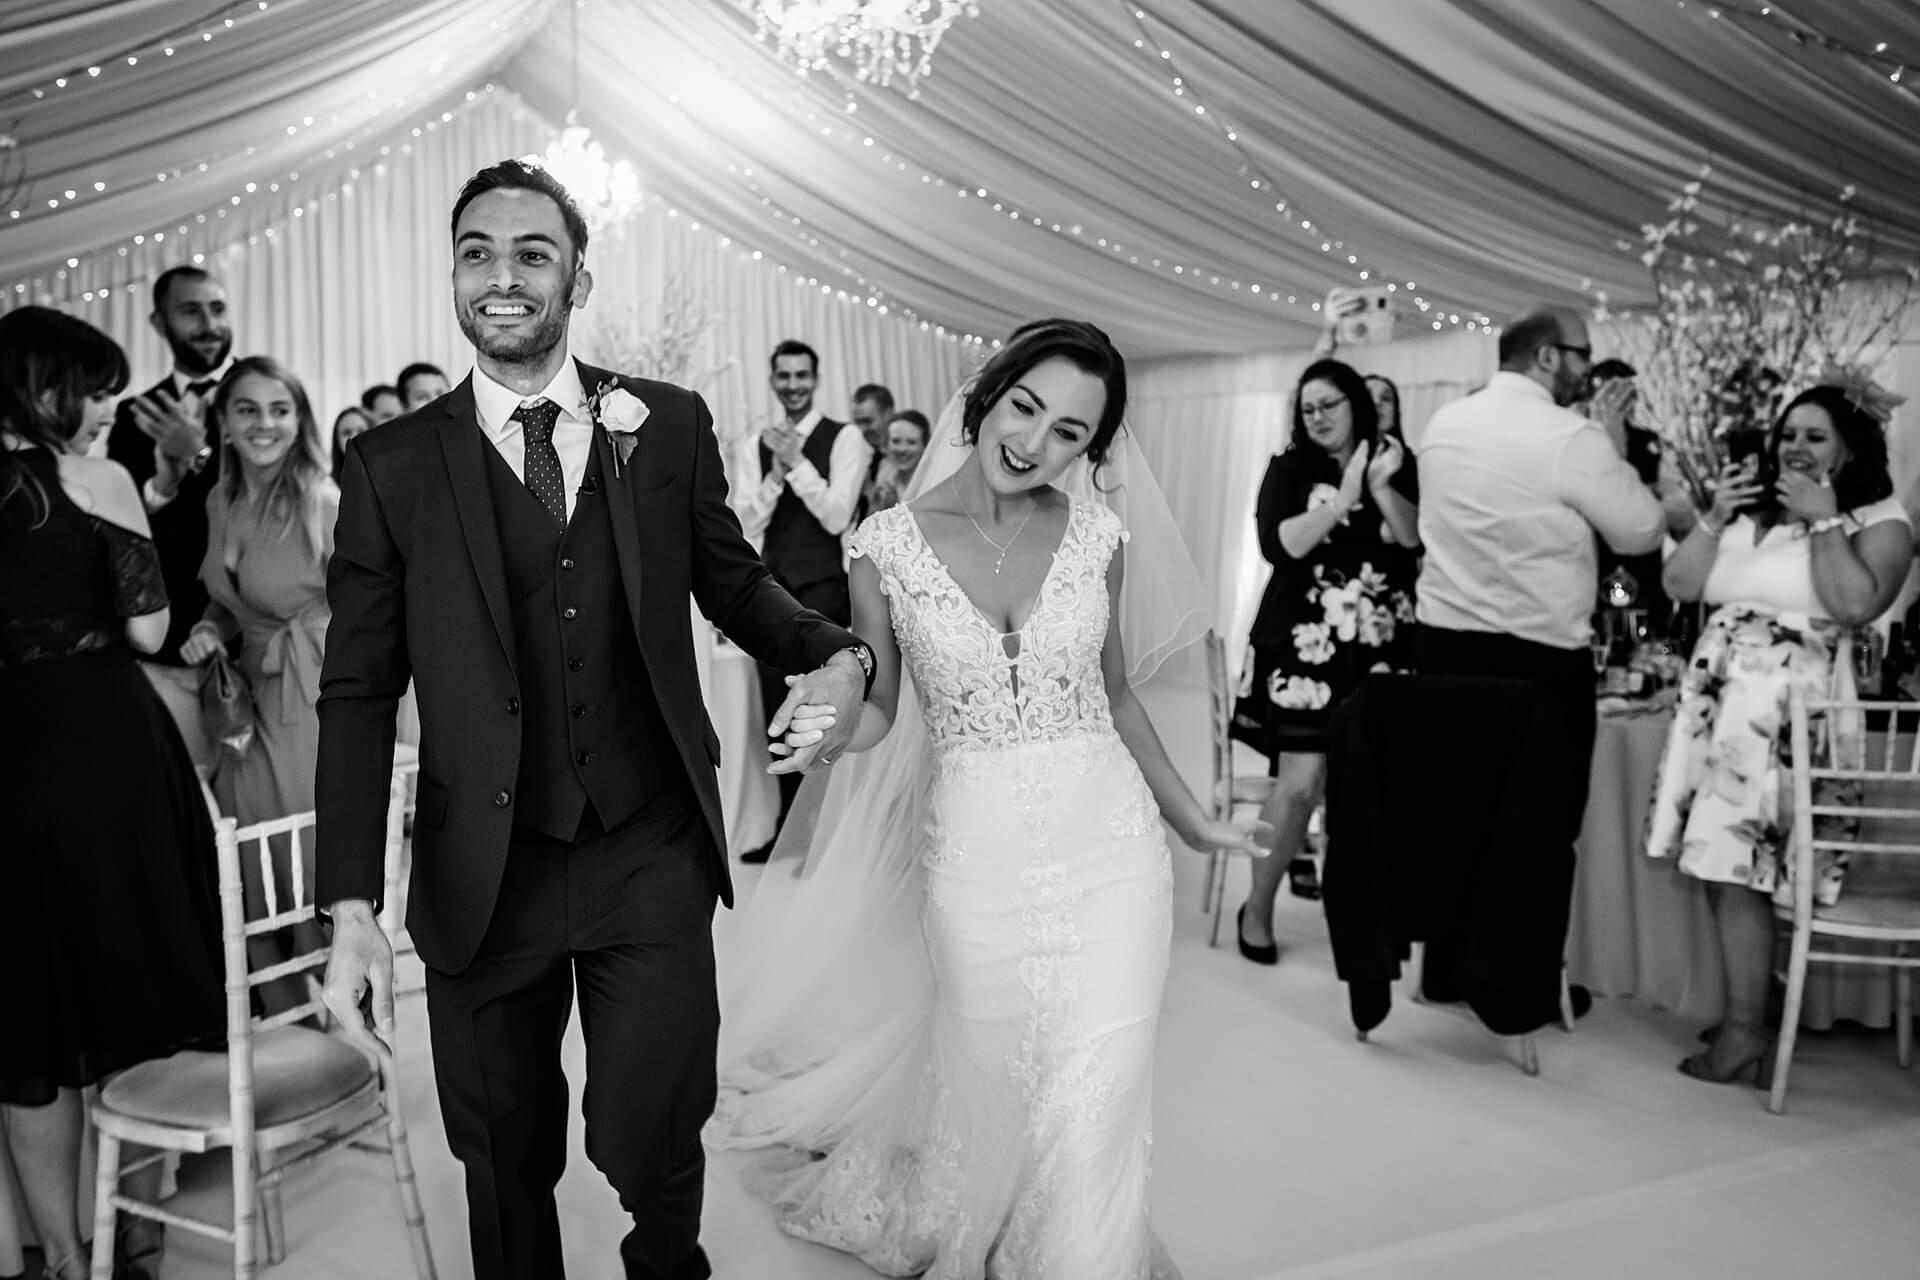 bride and groom walking into the wedding breakfast room to lots of cheers